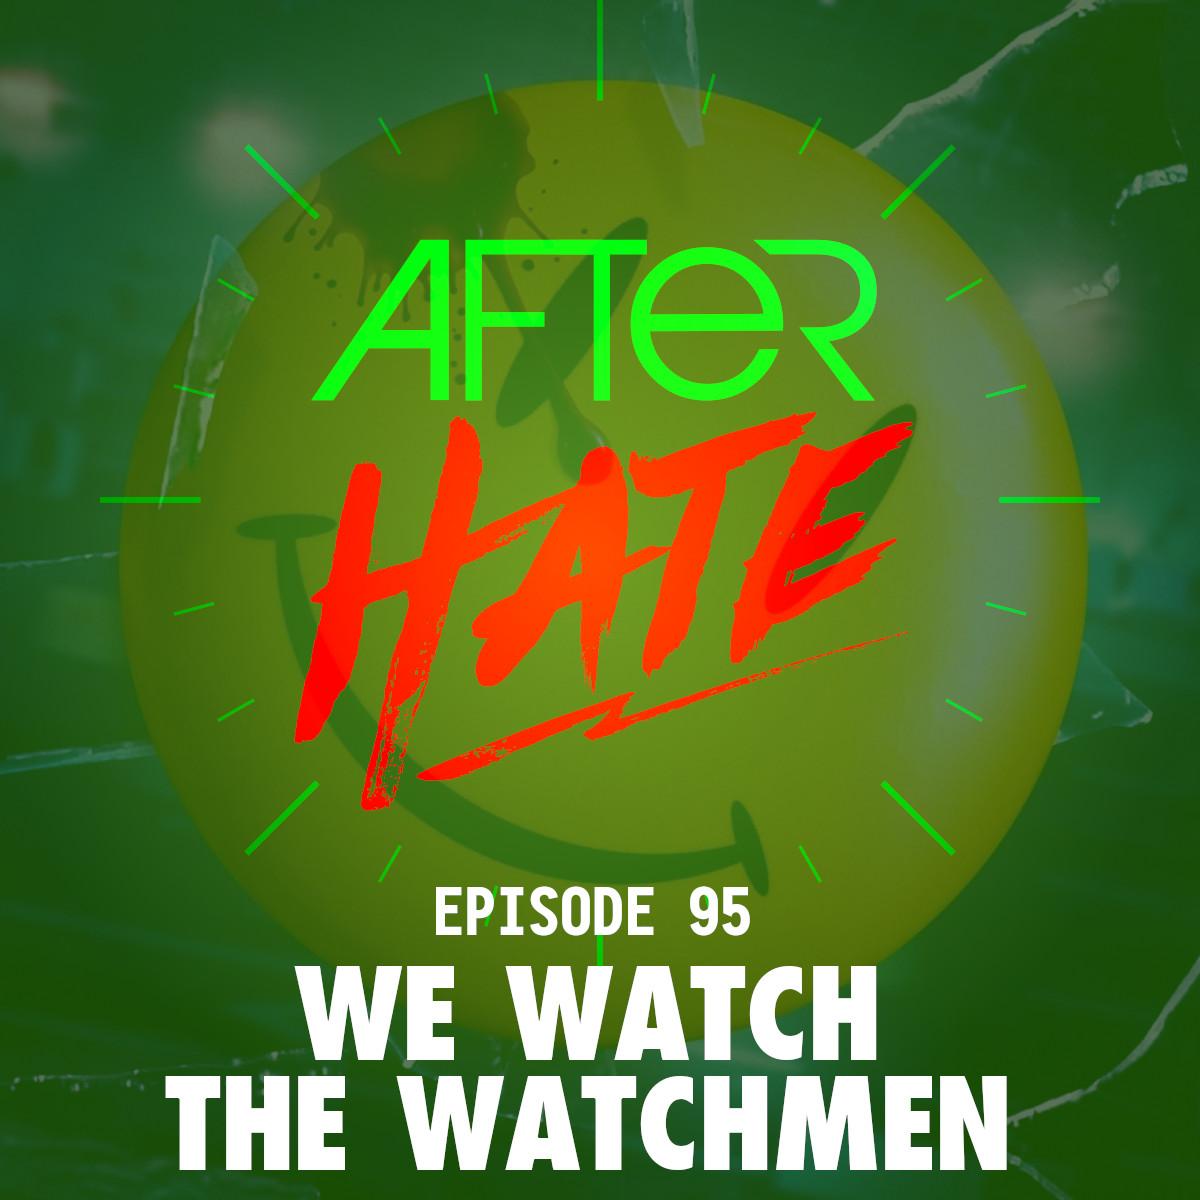 Episode 95 : We watch the Watchmen